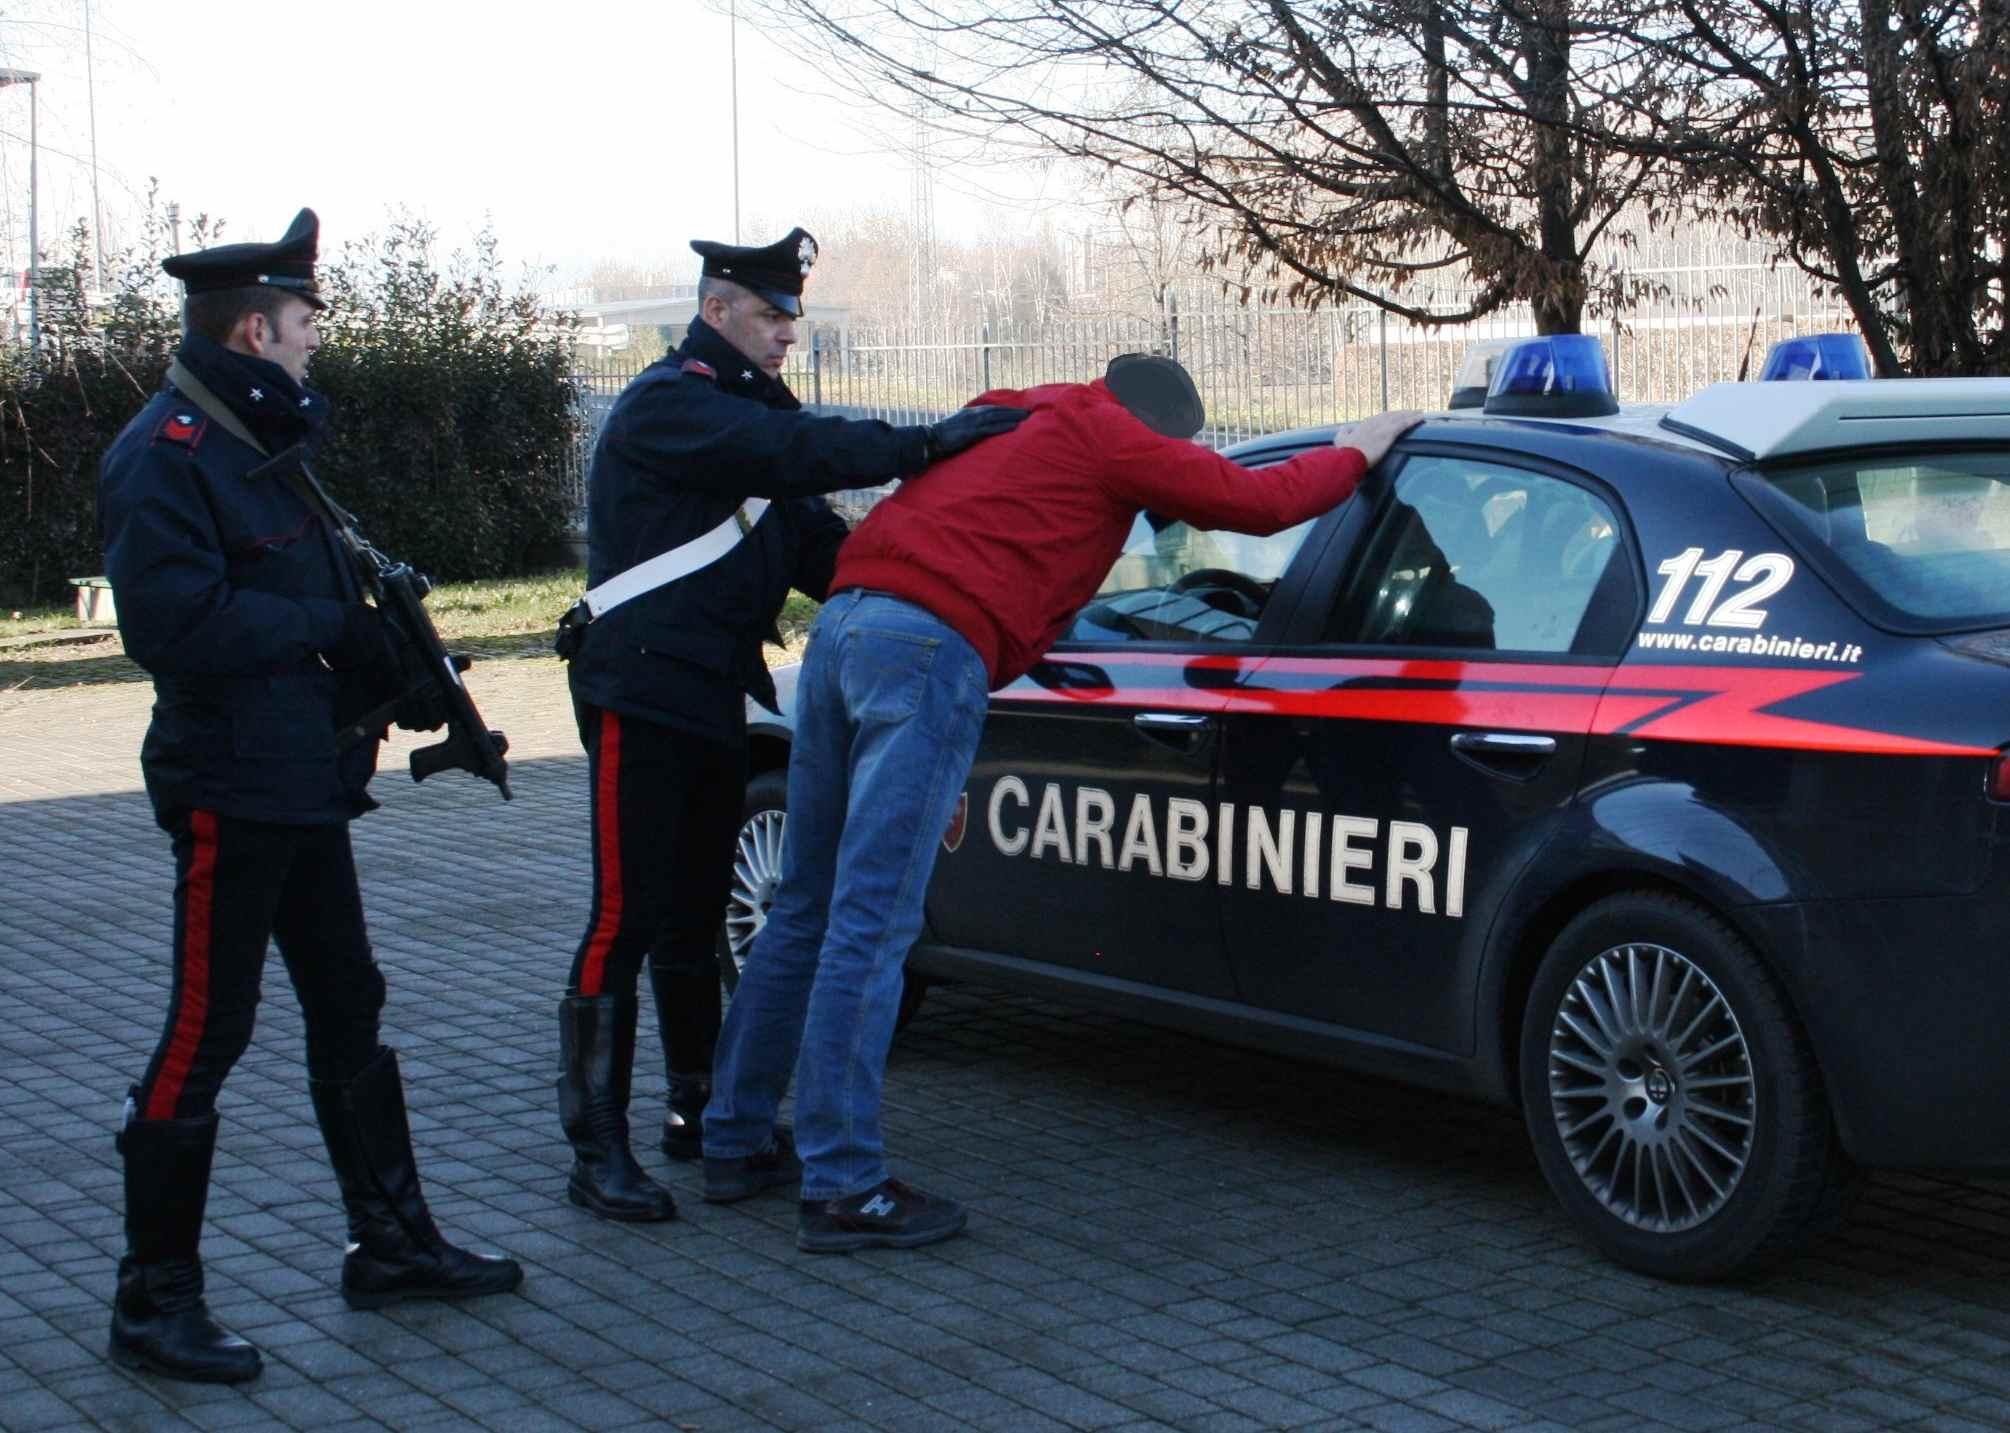 La Guida - Dieci pregiudicati arrestati dai Carabinieri per vari reati